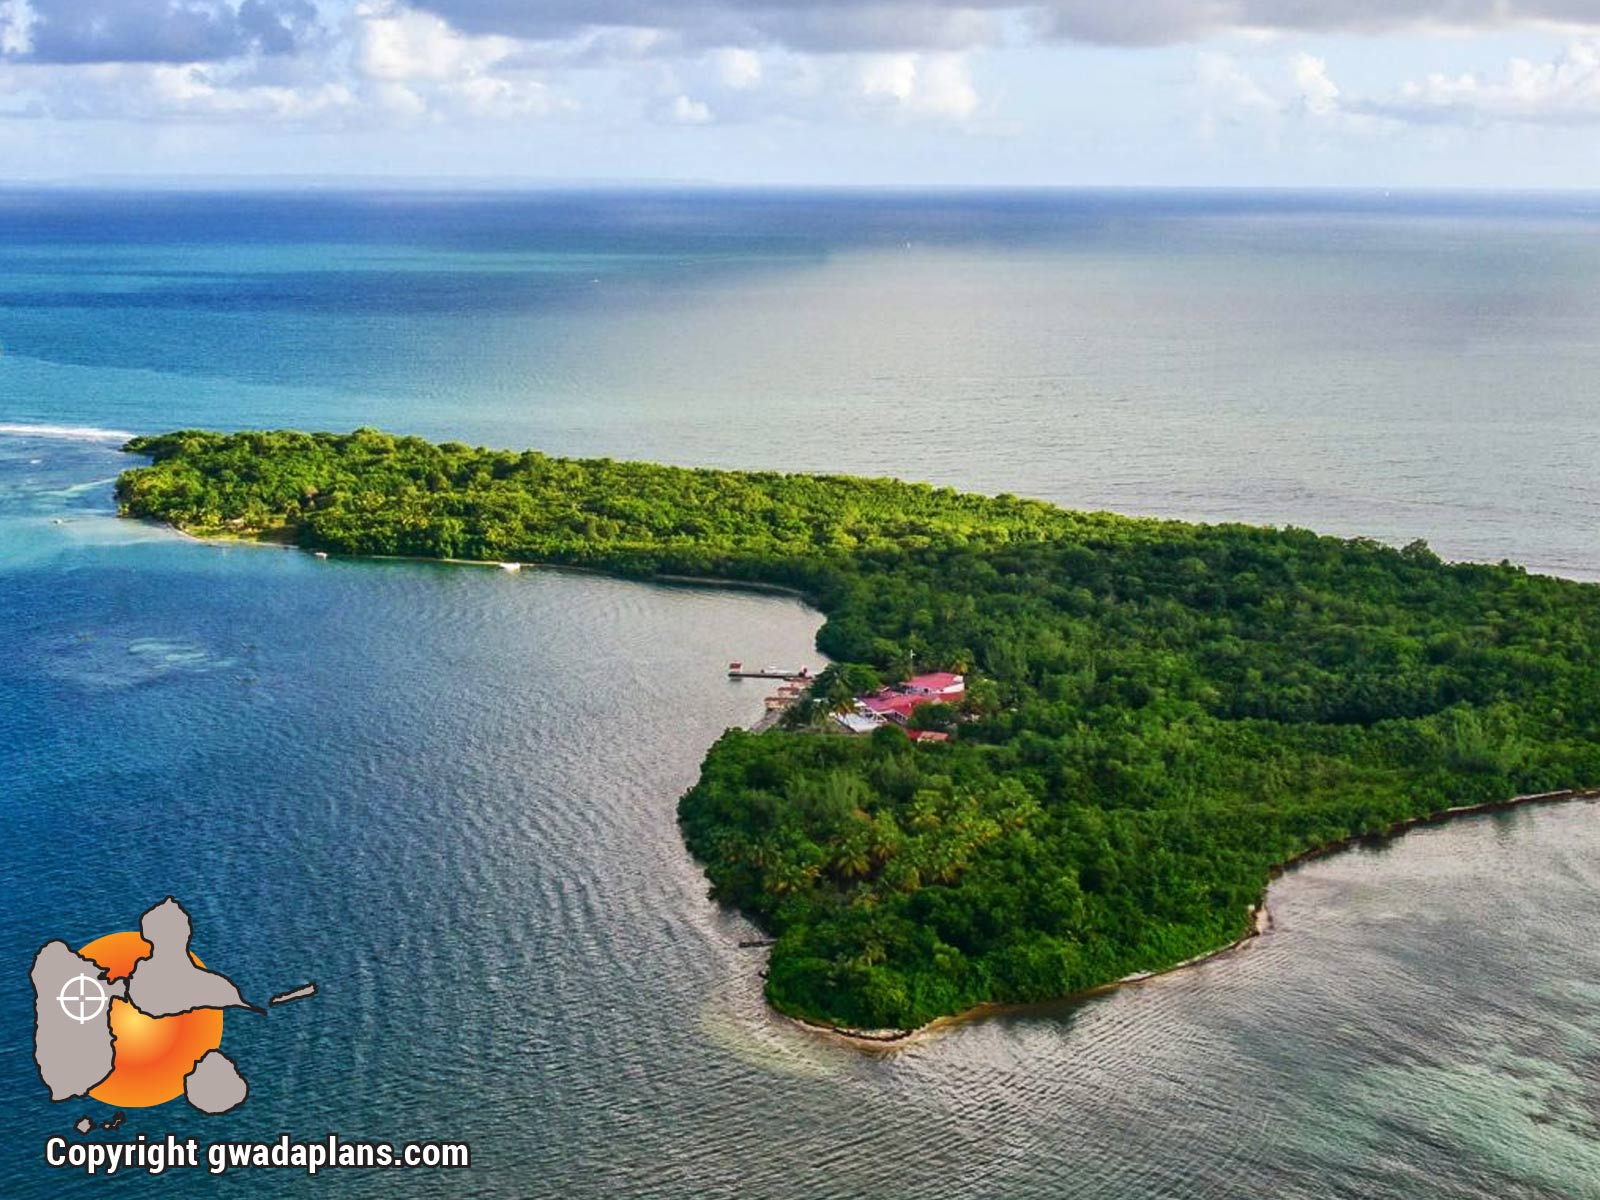 Ilet Cochons - Guadeloupe